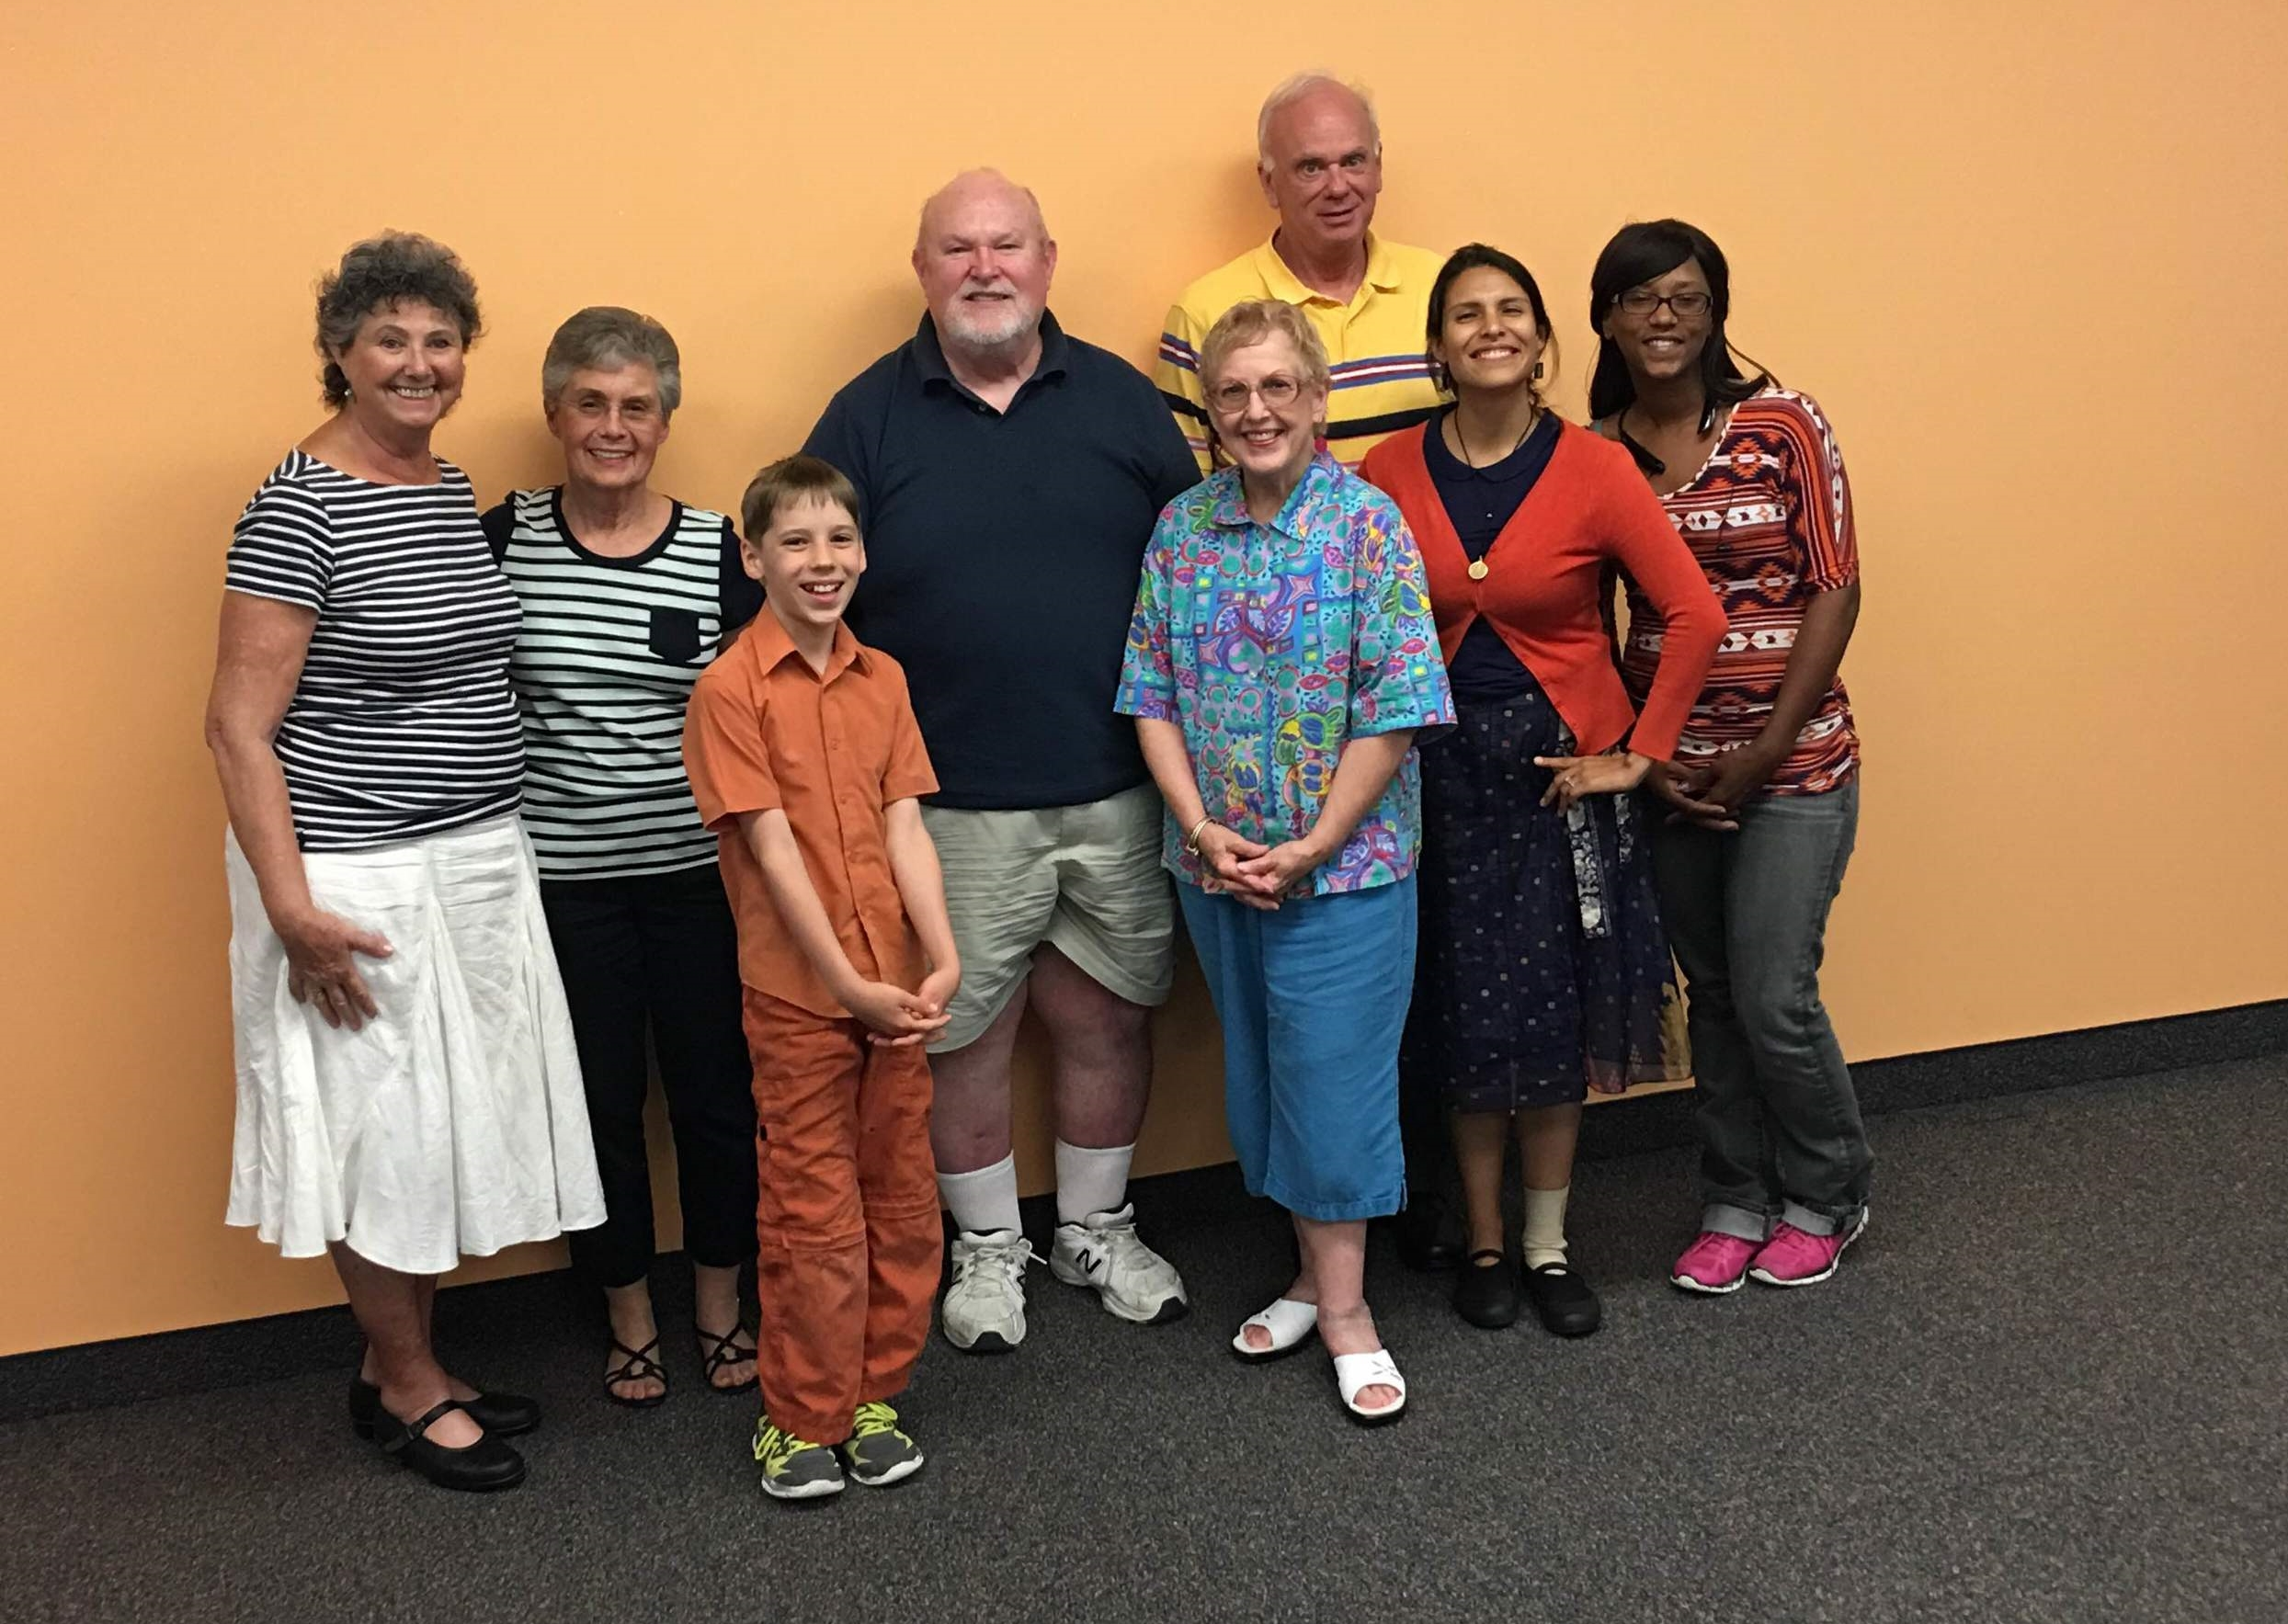 From Left to Right: Jane, Susan, Finn, John, Pat, Jamie, Carolina and Tracy